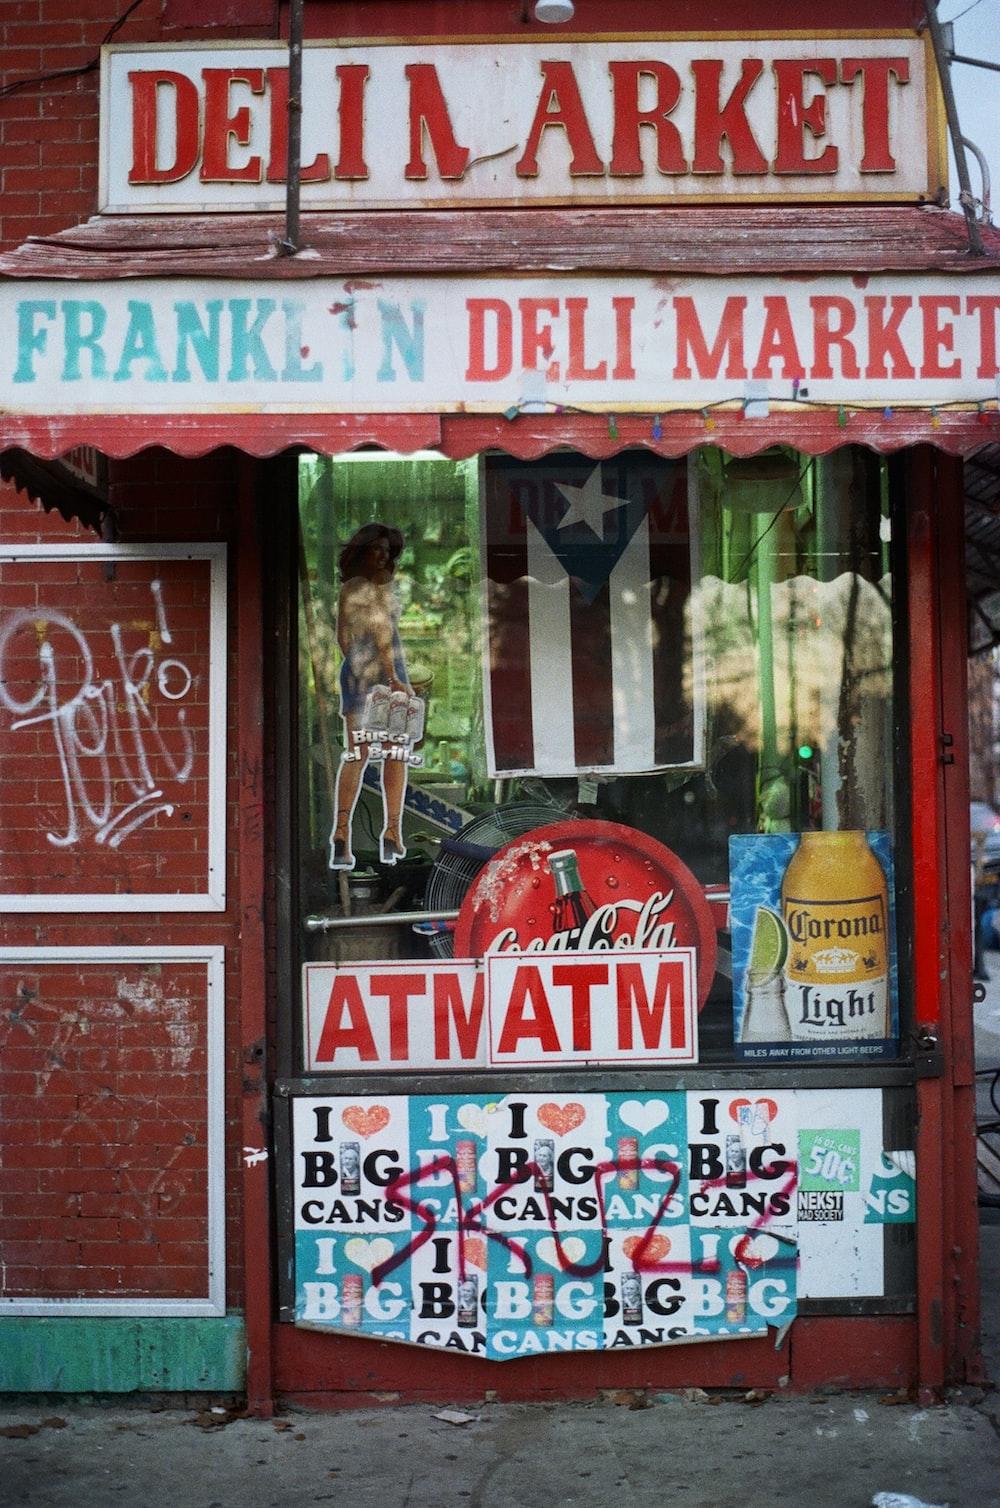 Deli Market storefront